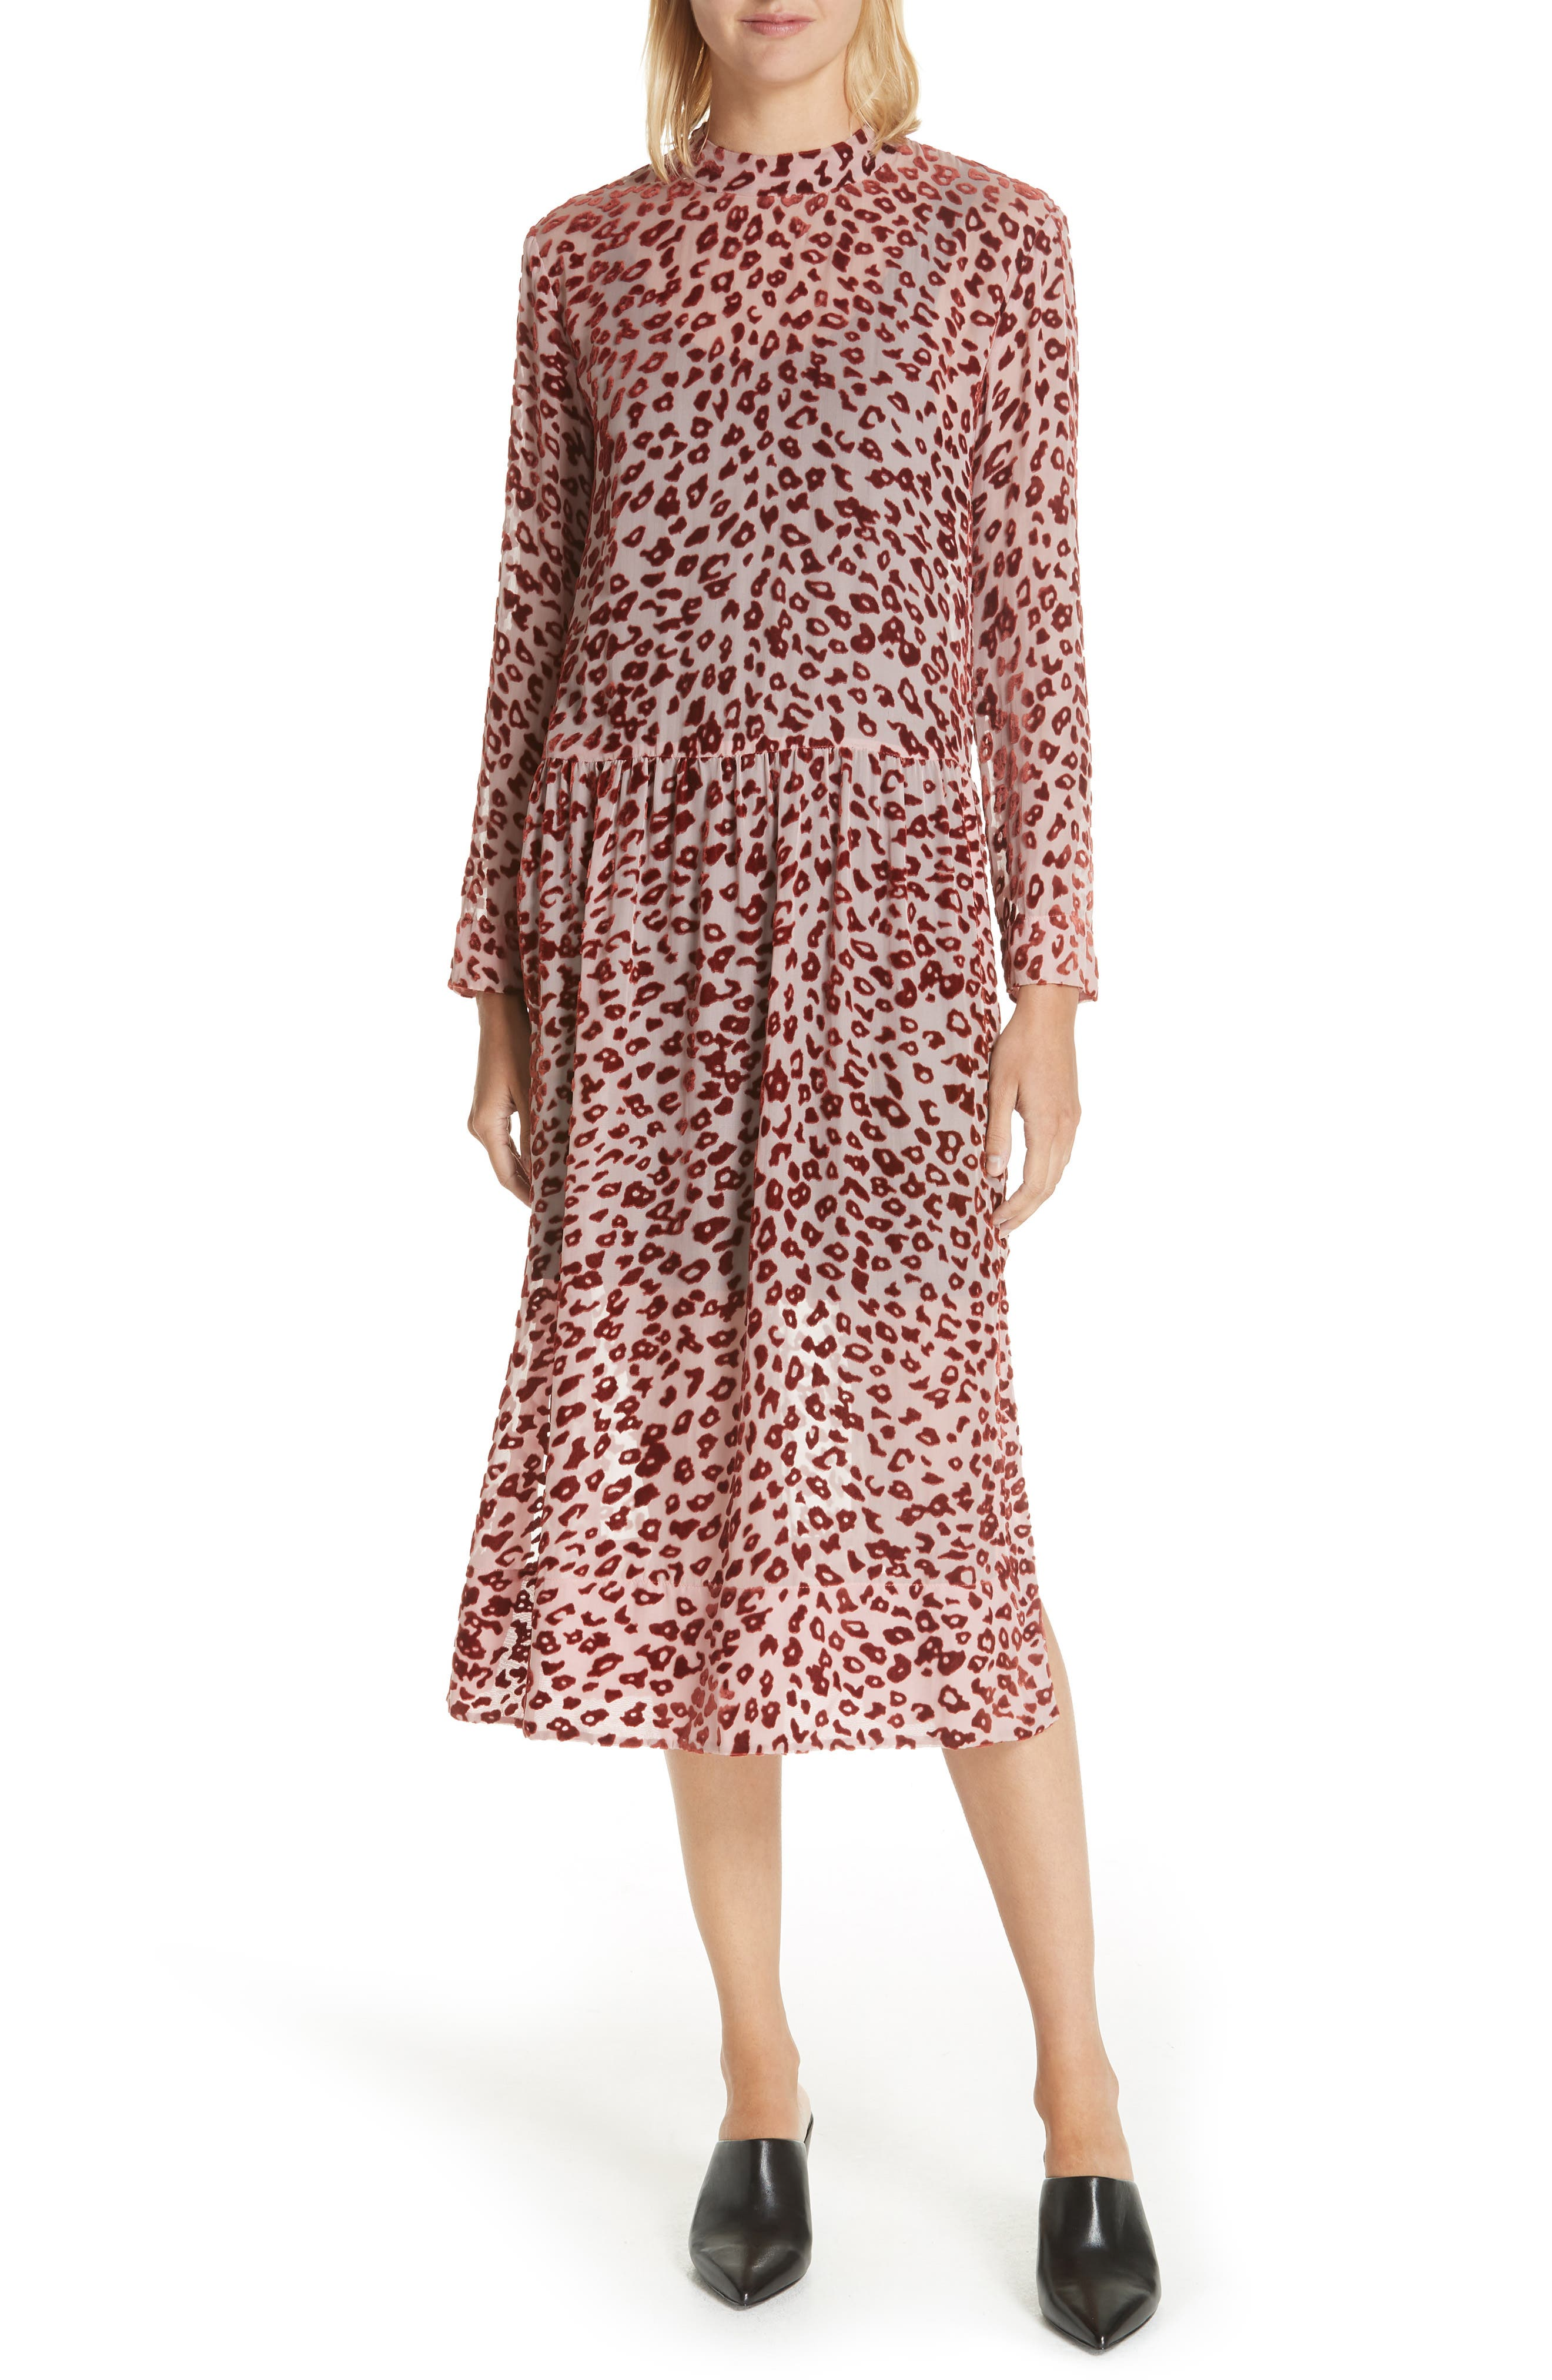 Rag & Bone Gia Devore Leopard Spot Dress, Pink